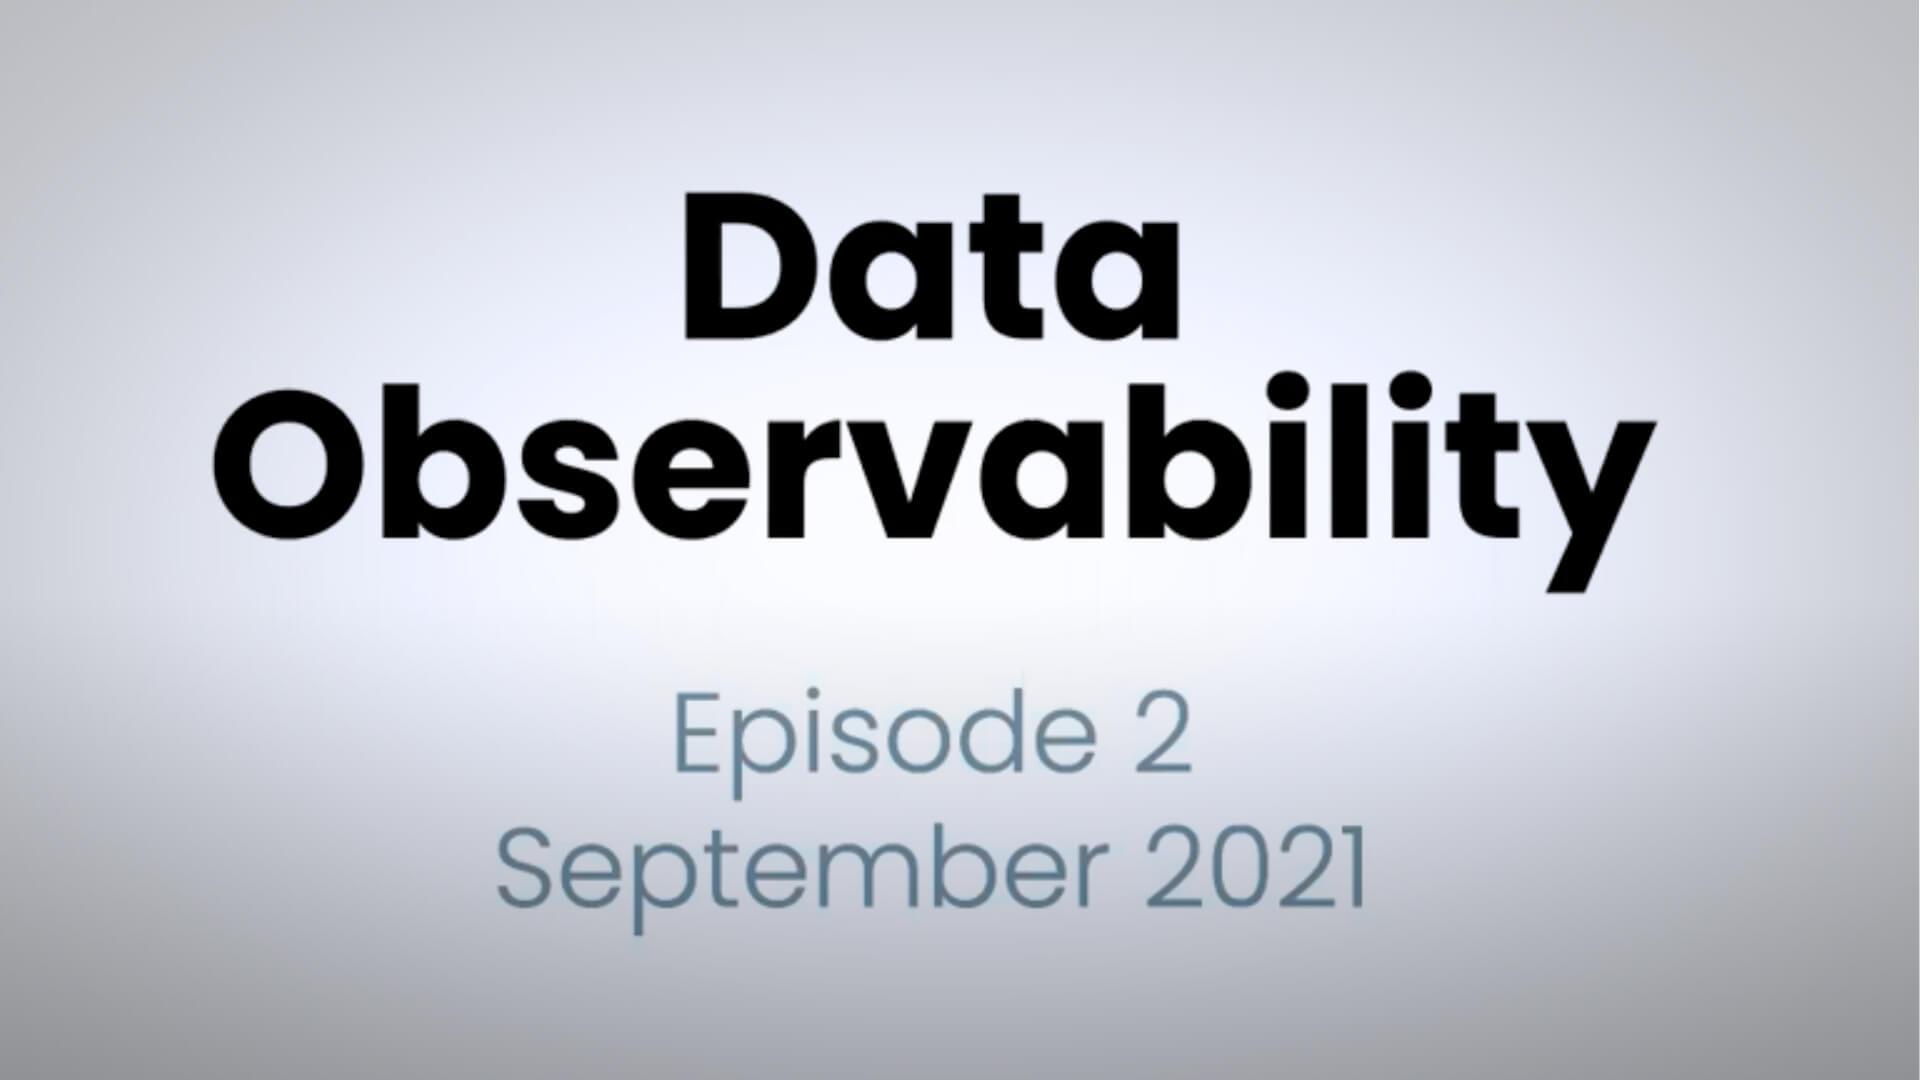 Thumb-data observability